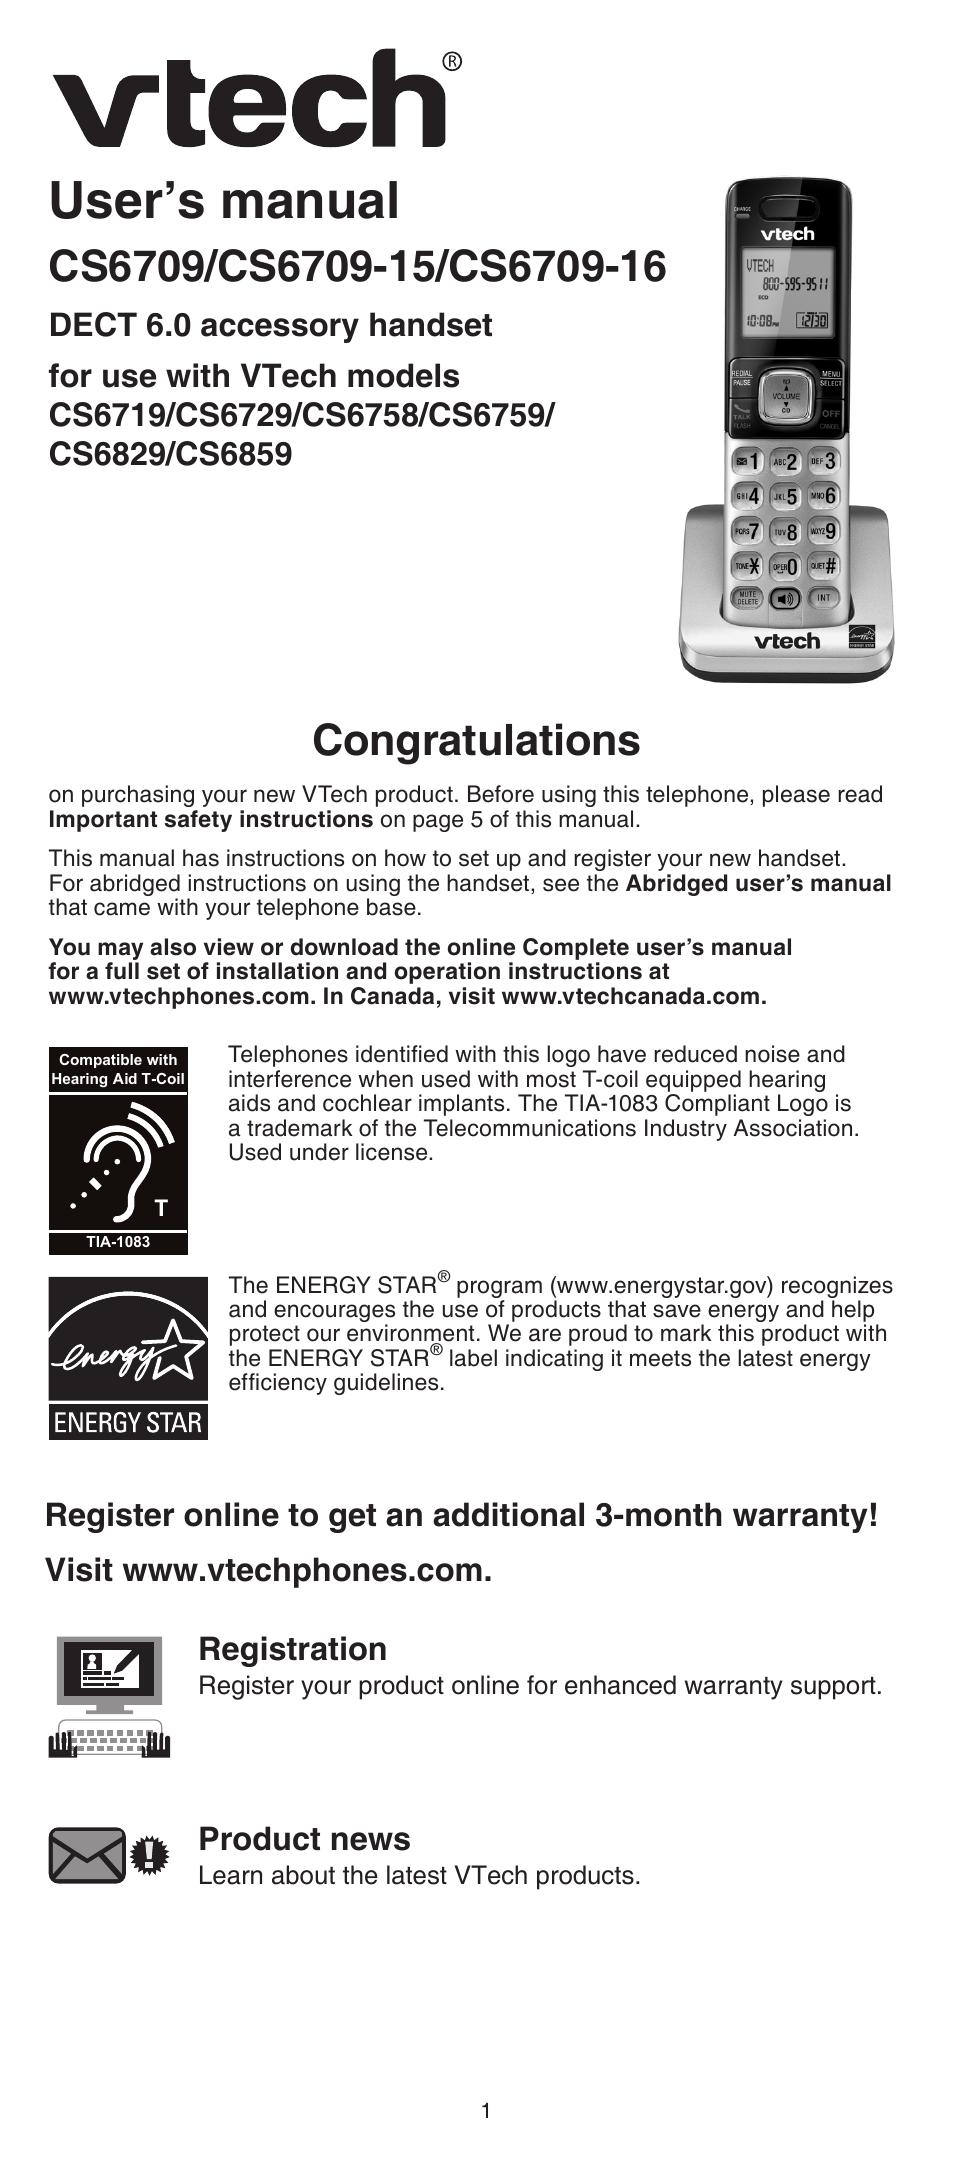 Vtech Cs6709 15 16 Manual User Manual 8 Pages